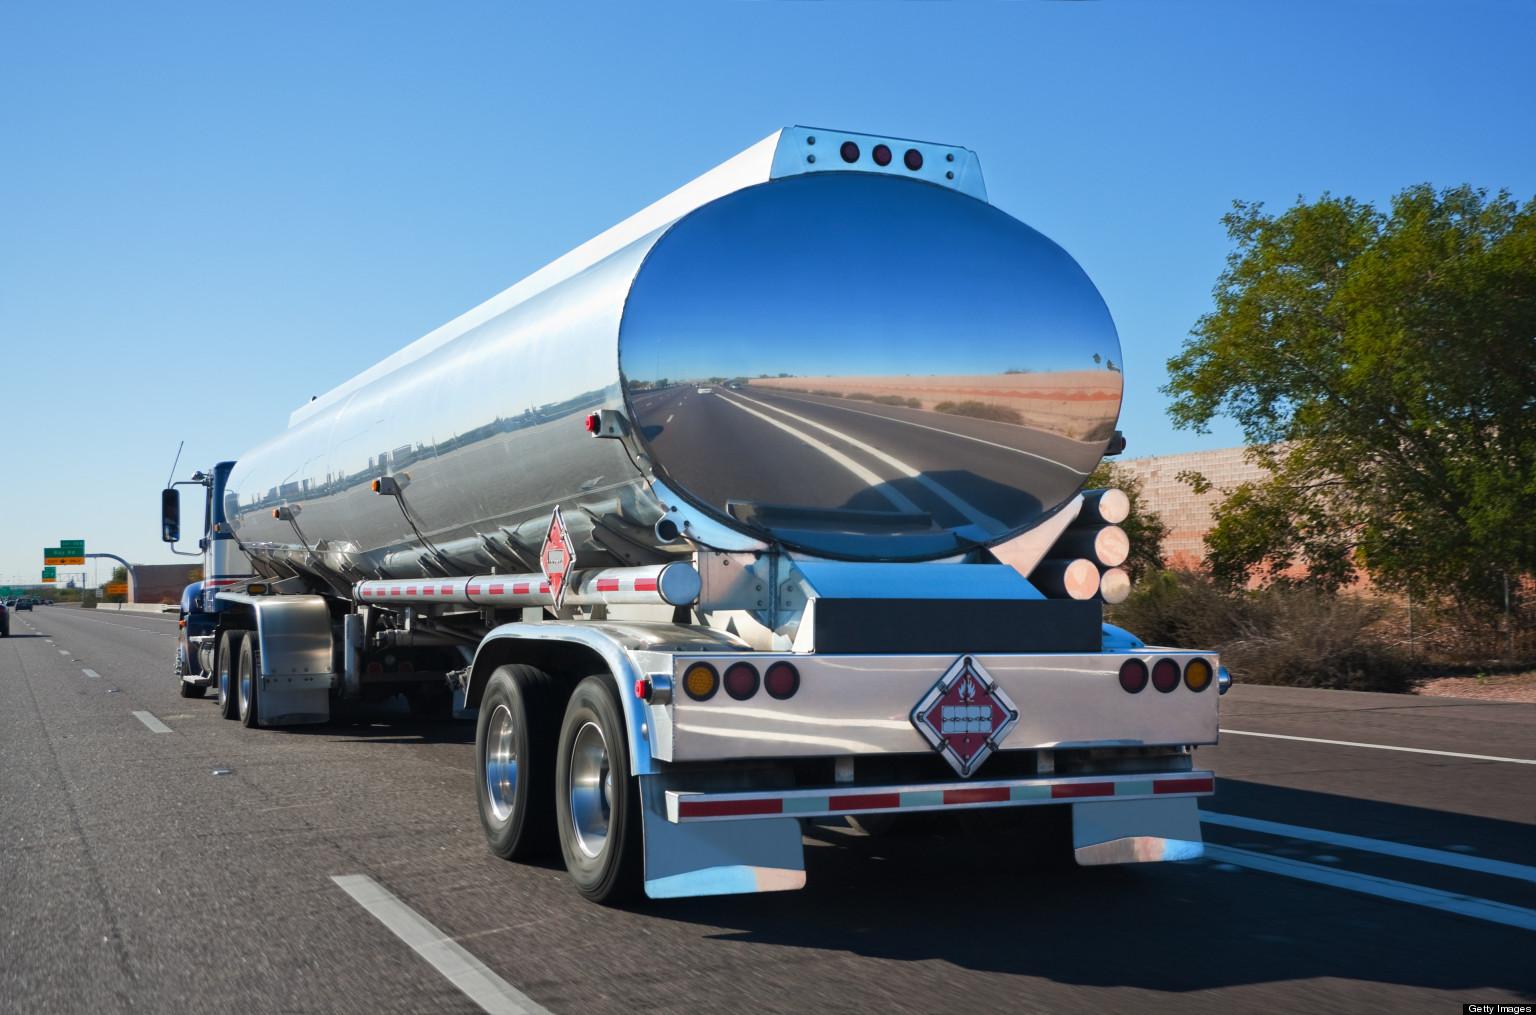 energy tansport, fuel company, gasoline, biodiesel, ehtanol, diesel, huntsville, alabama, petroleum, transport fleet, petroleum delivery, petroleum trucking, fuel hauling